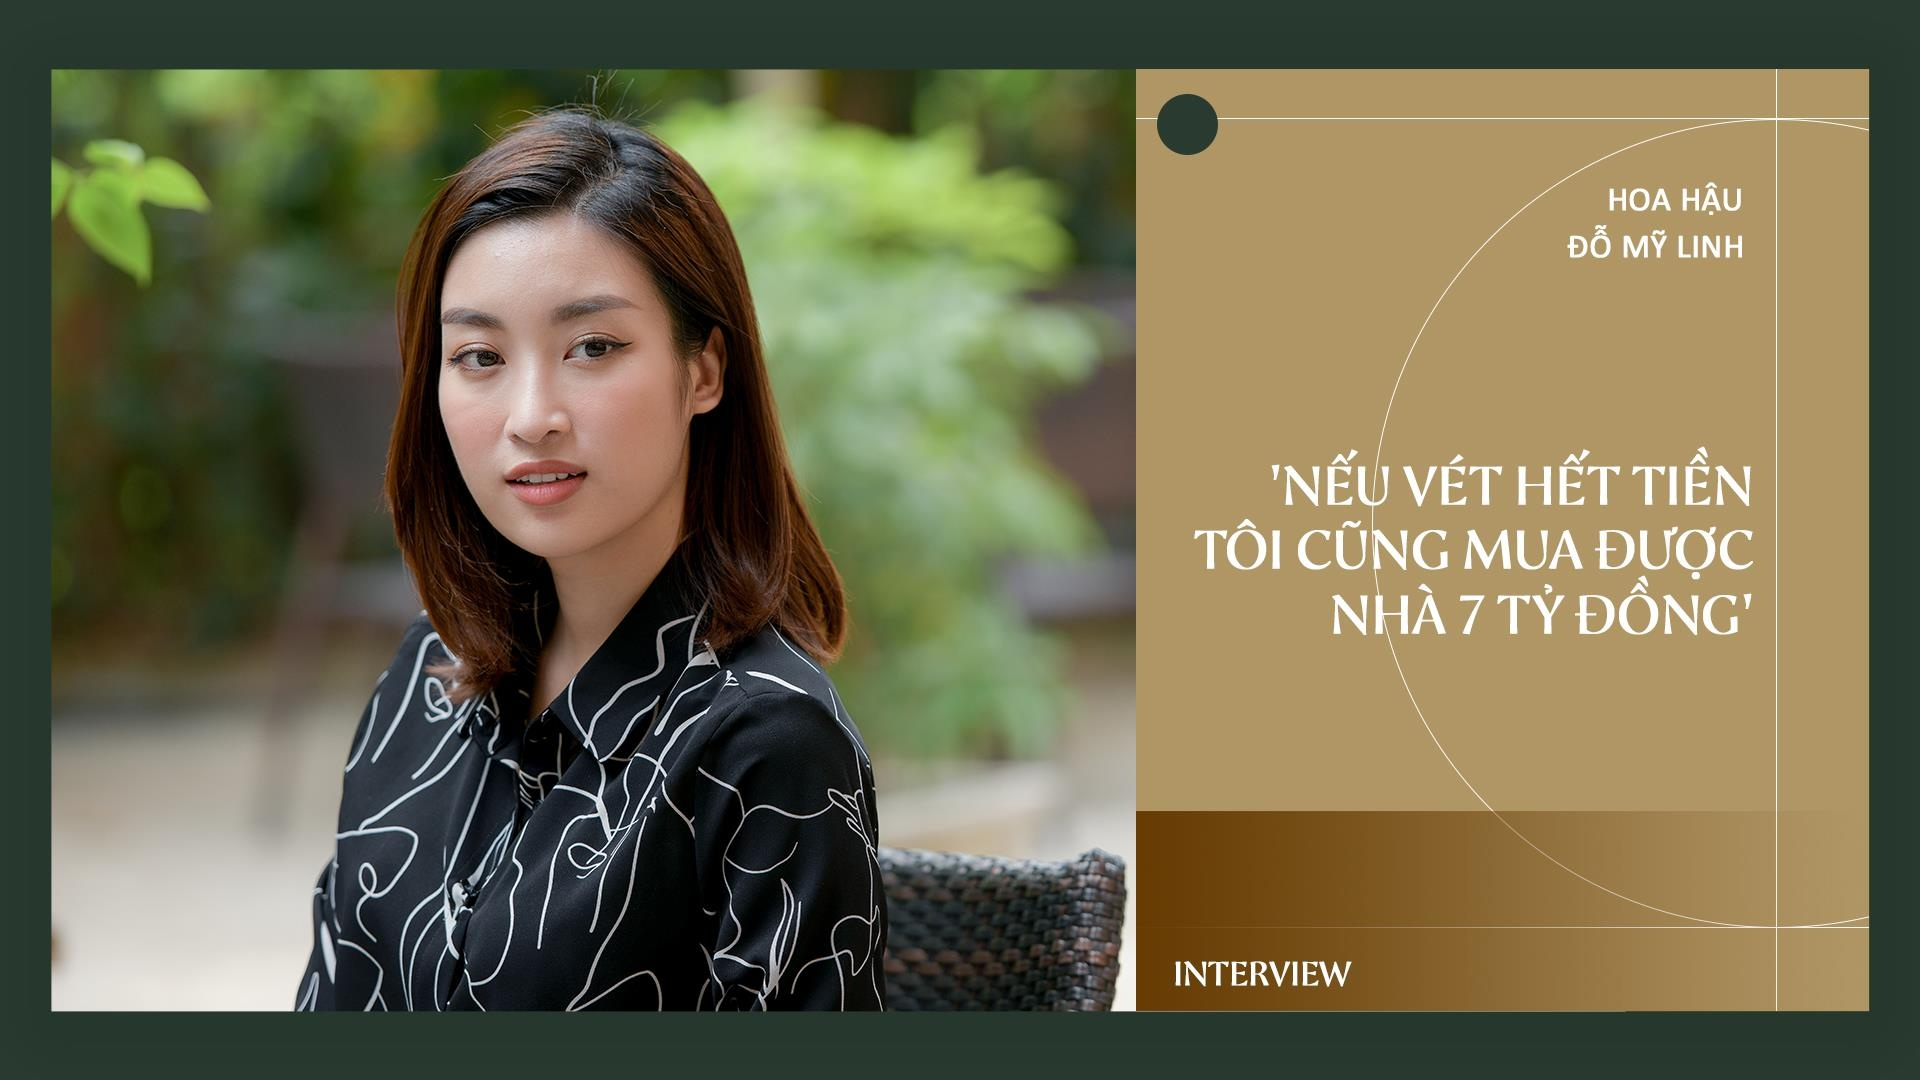 Hoa hau Do My Linh: 'Neu vet het tien toi cung mua duoc nha 7 ty dong' hinh anh 2